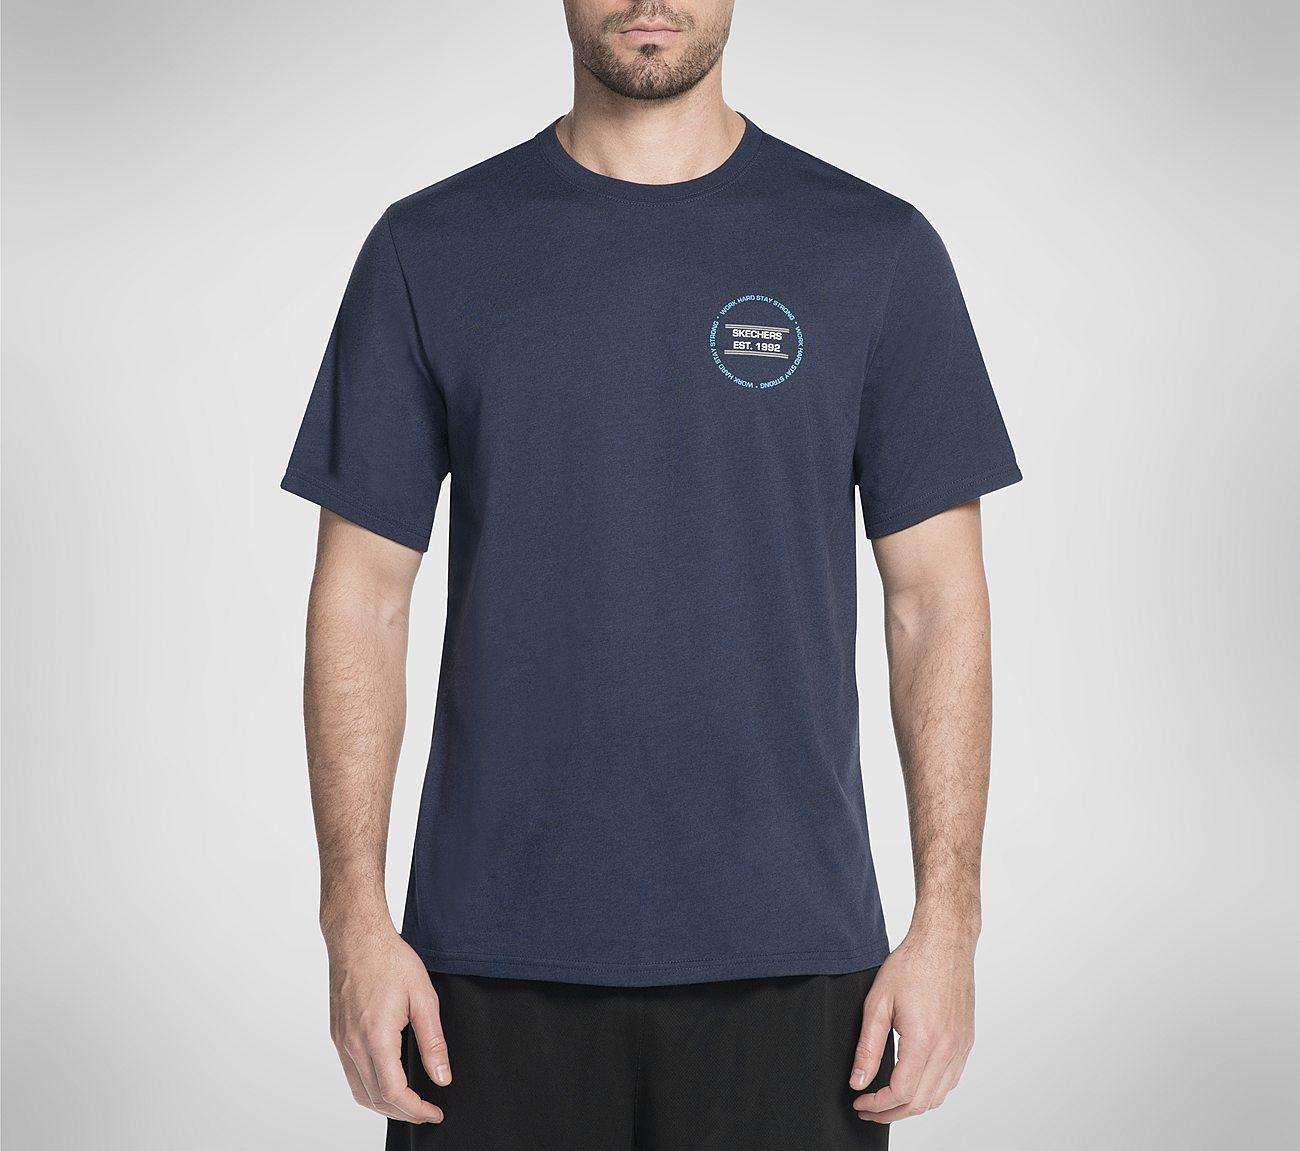 Established Tee Shirt